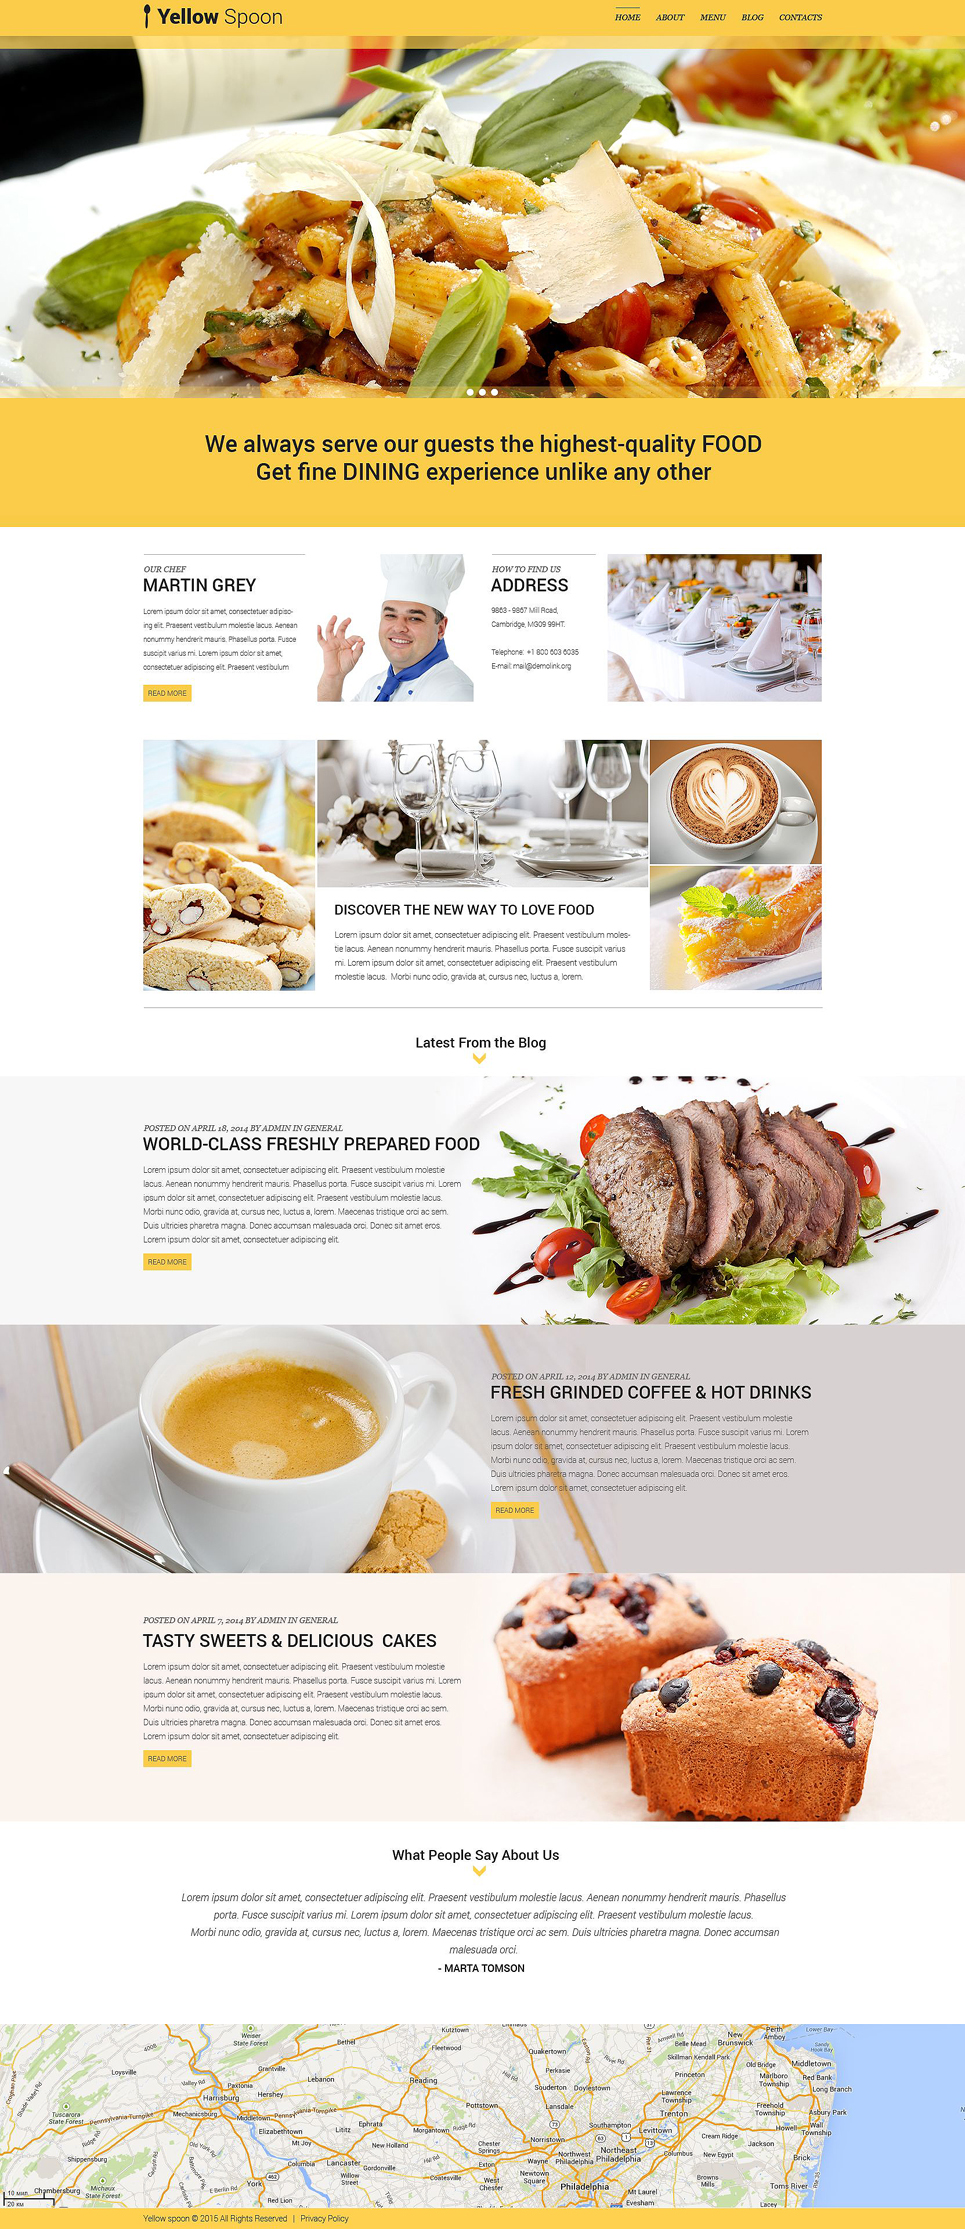 Yellow Spoon - Restaurant Management WordPress Theme